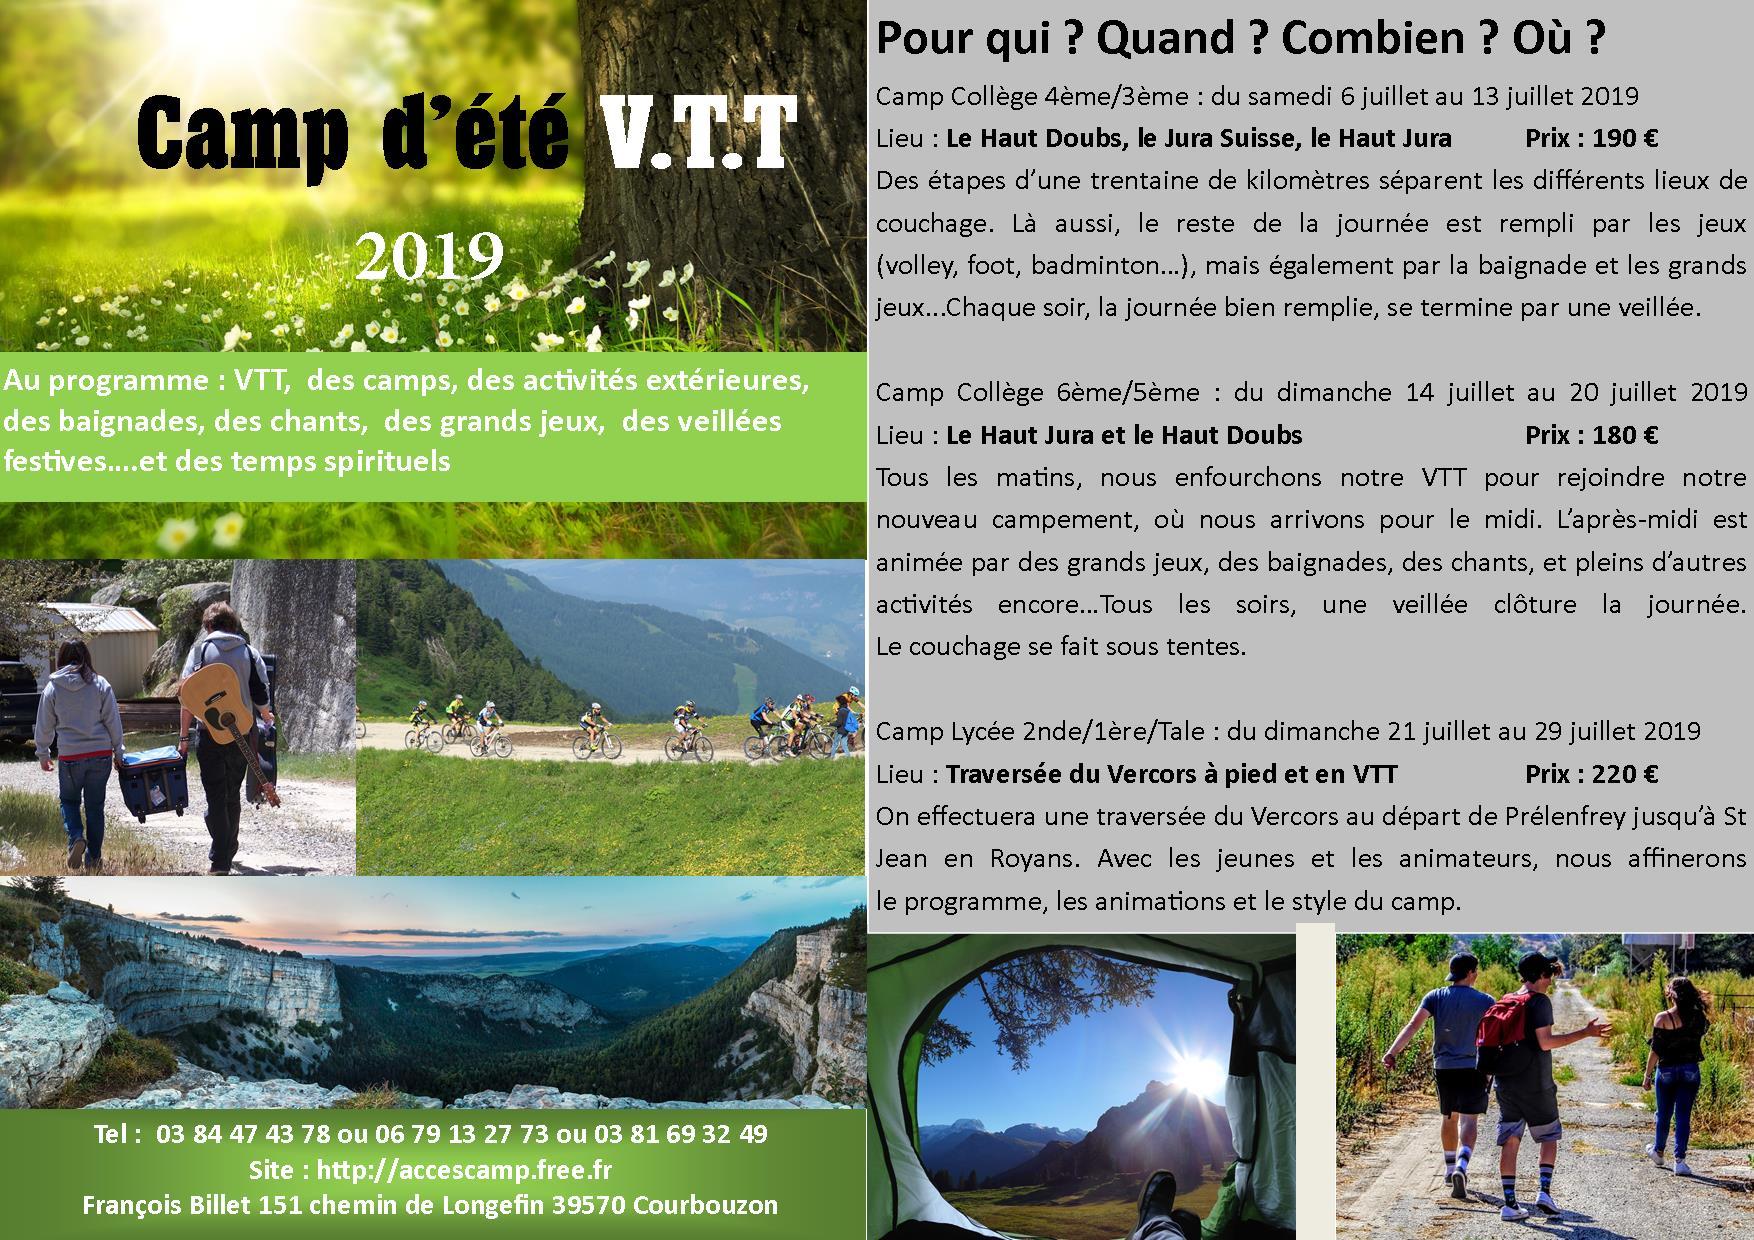 Camp ete 2019